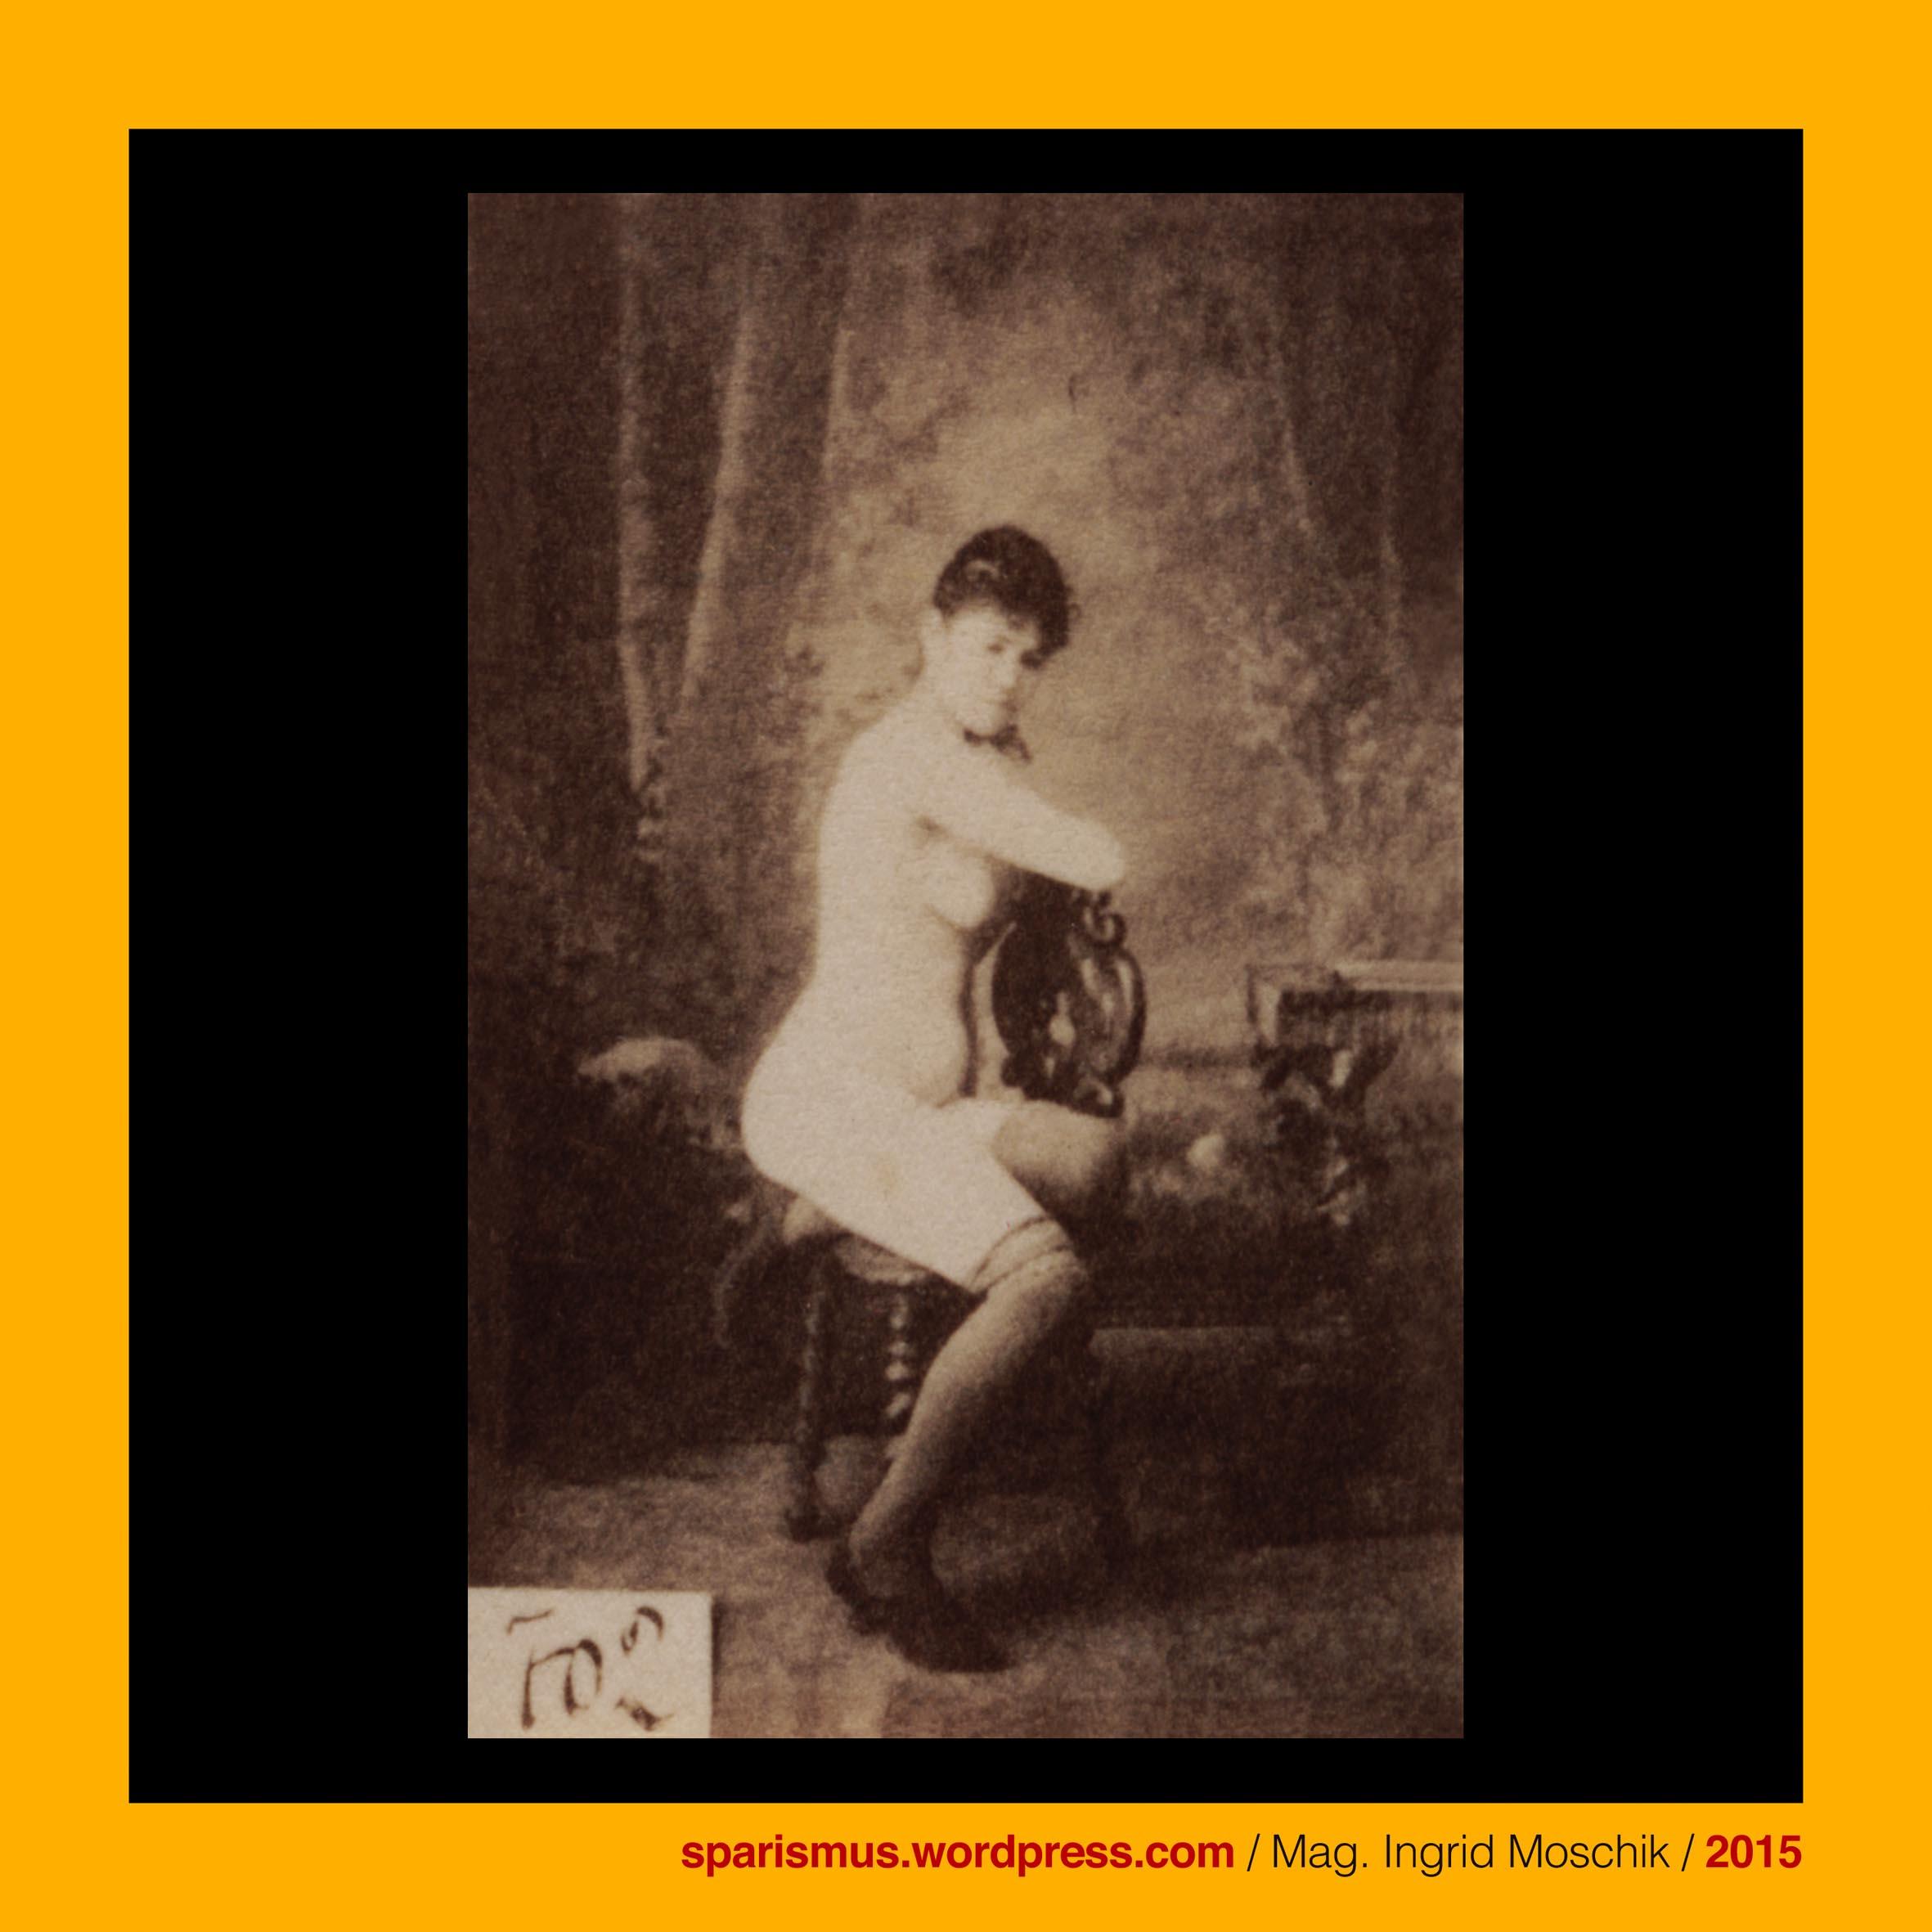 Otto Schmidt Wien 702 1885 Nackte Frontal überkniestrümpfe